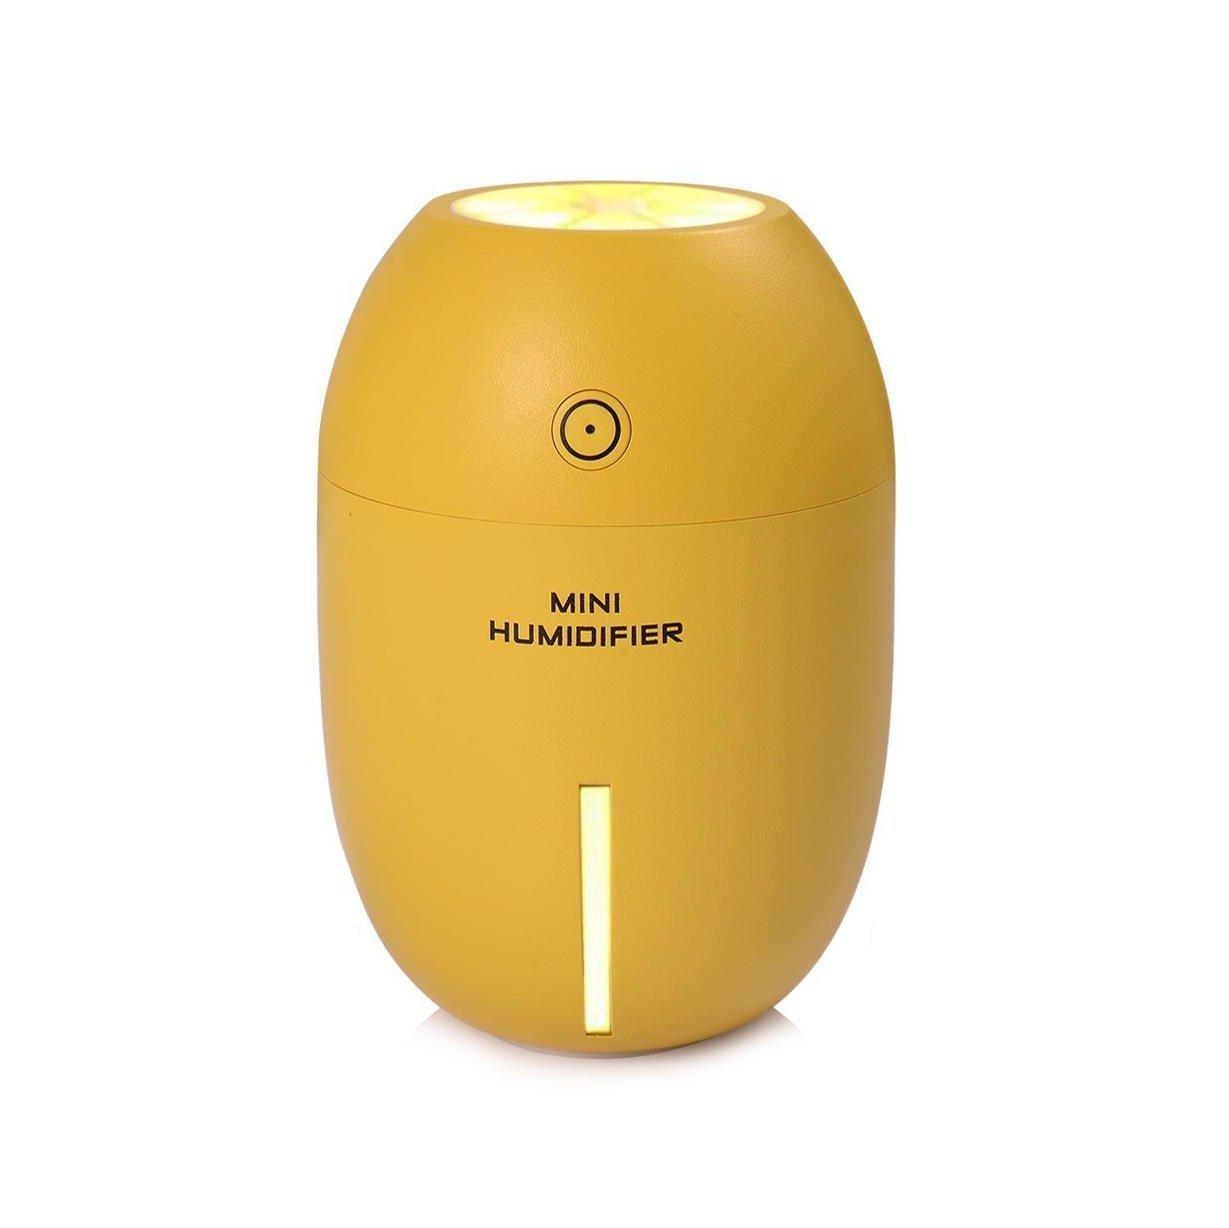 Illumination - Light Usb Humidifier Portable 180ml Mist Car Air Purifier Diffuser - Airy Wakeful Bright Brightness Insufficient Temperate Visible Luminosity Feathery - 1PCs